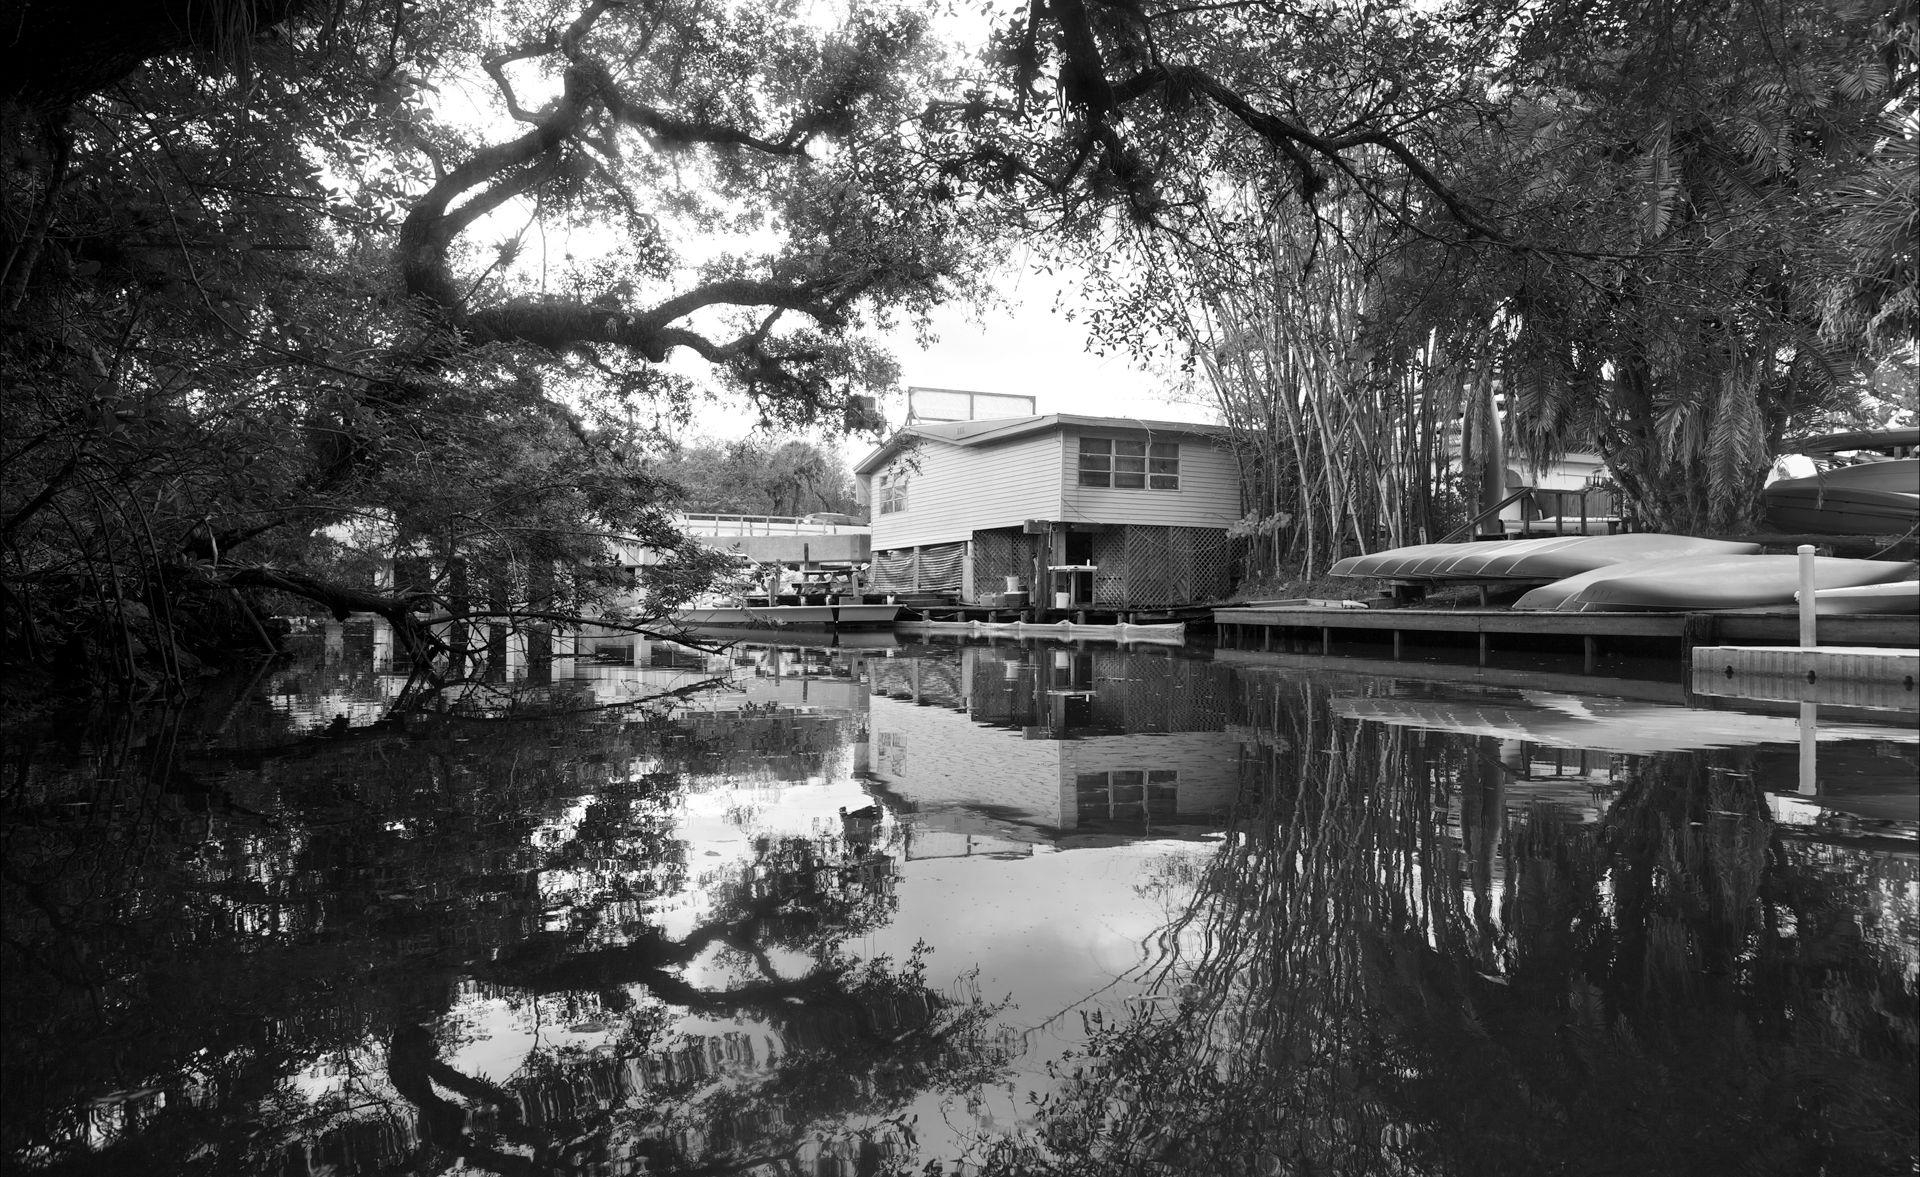 Estero Canoe Rental